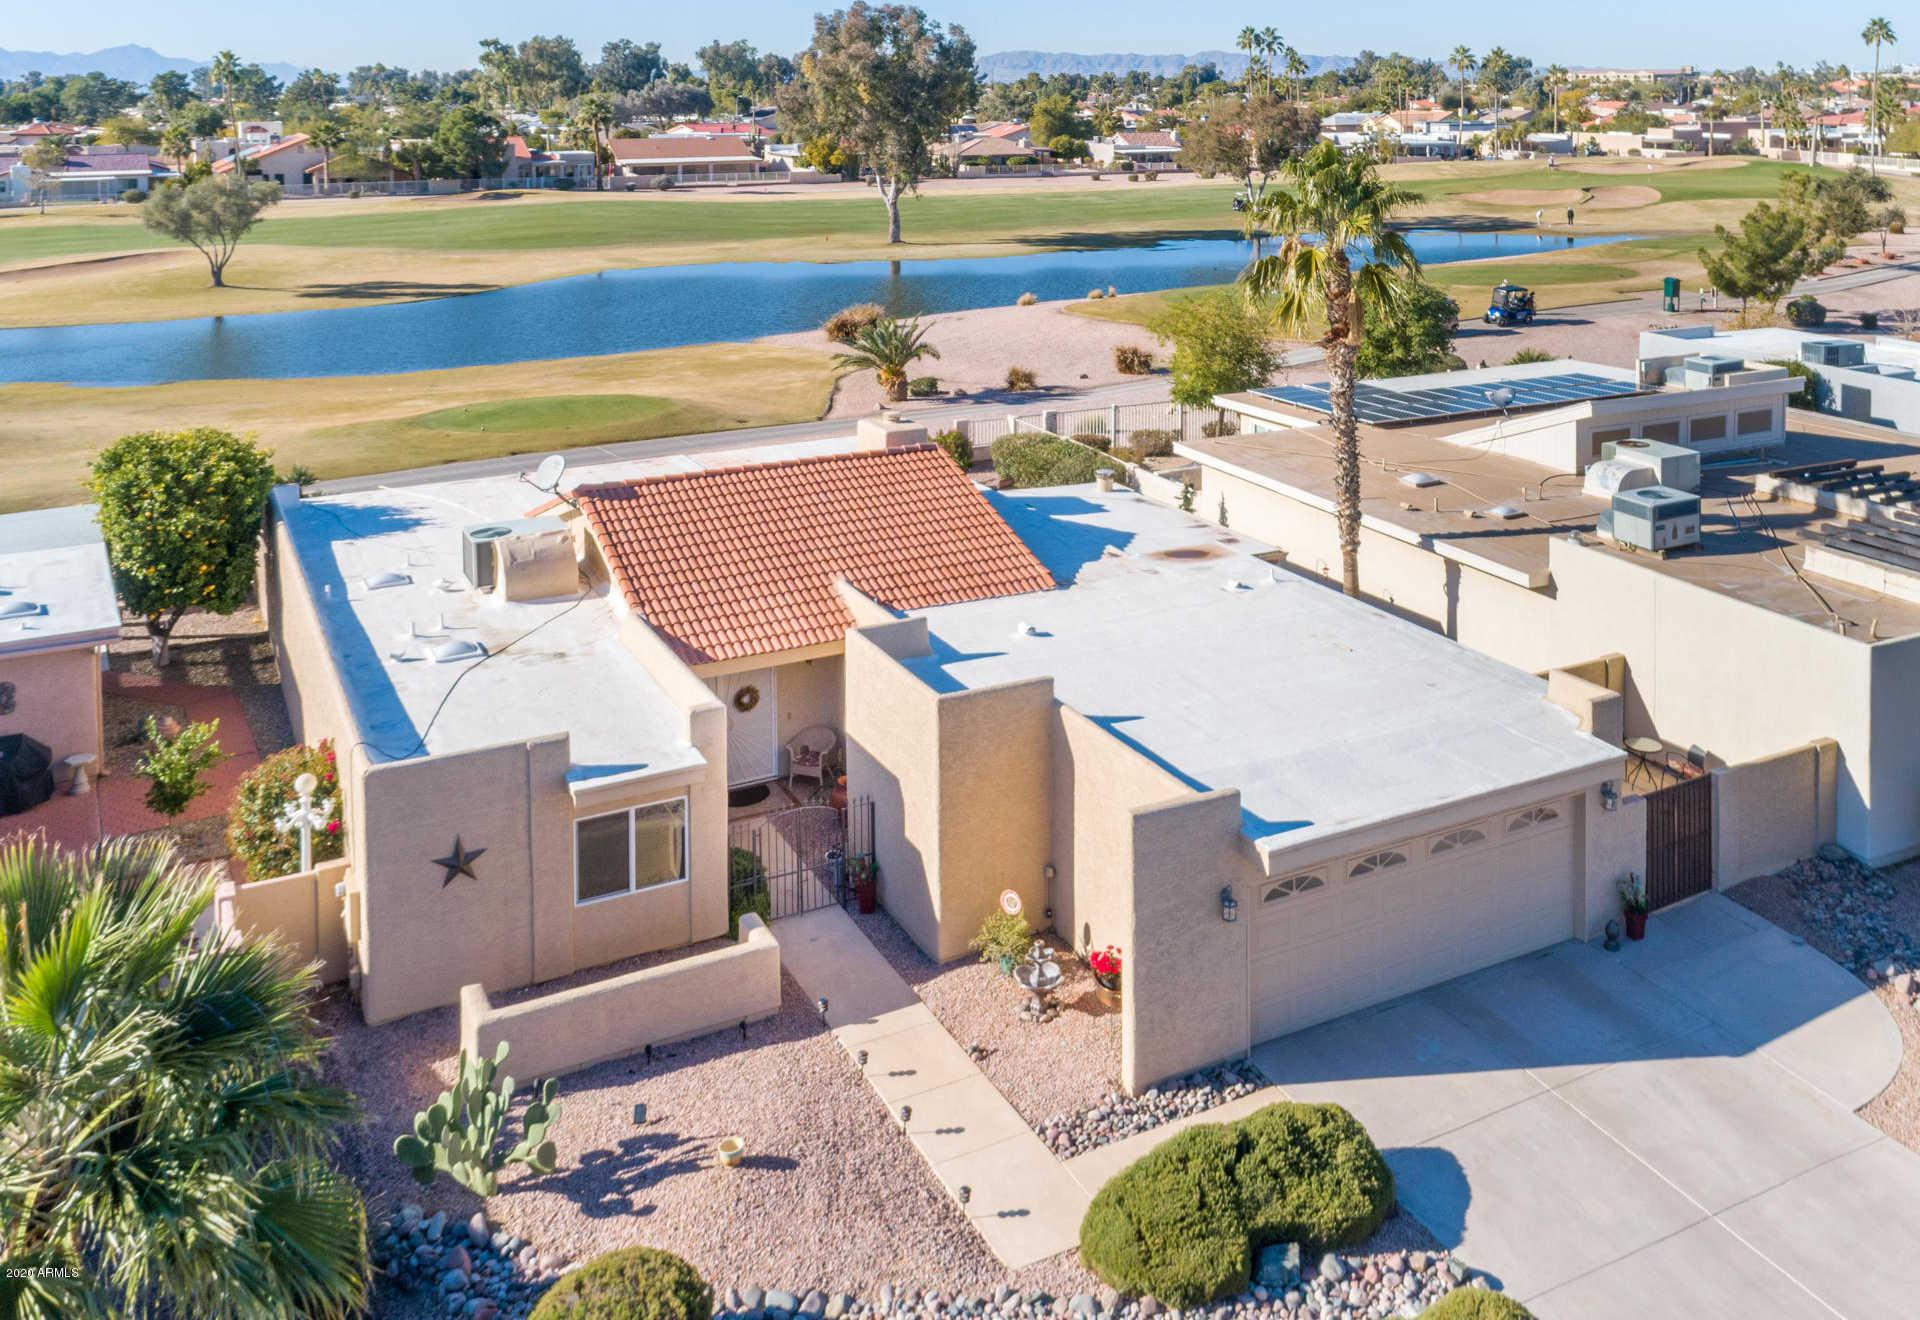 $449,900 - 2Br/2Ba - Home for Sale in Sun Lakes 12 Lot 1-212 Tr A-e, Sun Lakes